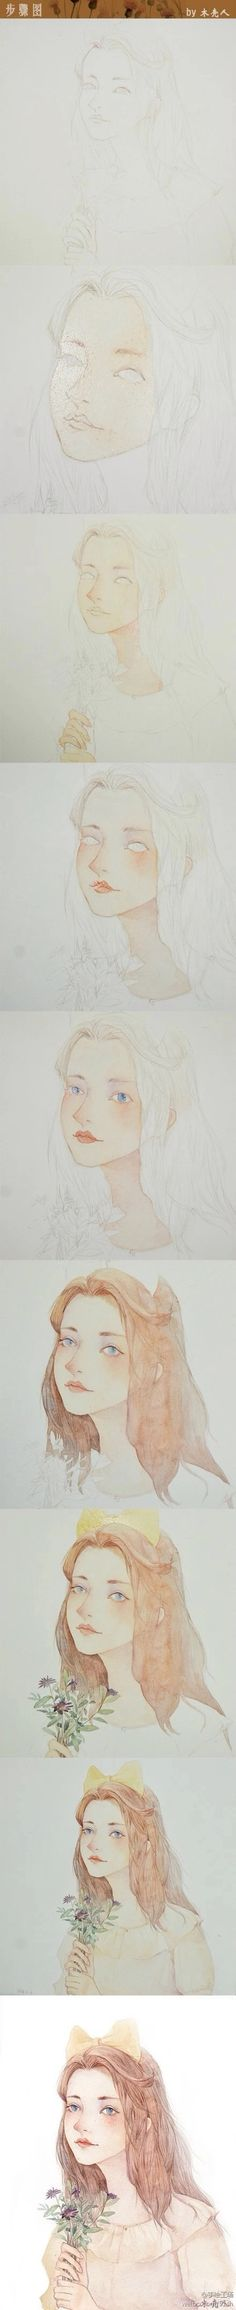 000 Watercolor Journal, Watercolor Artwork, Watercolor Portraits, Watercolor Illustration, Watercolour Tutorials, Watercolor Techniques, Manga Paint, Guache, Drawing Skills